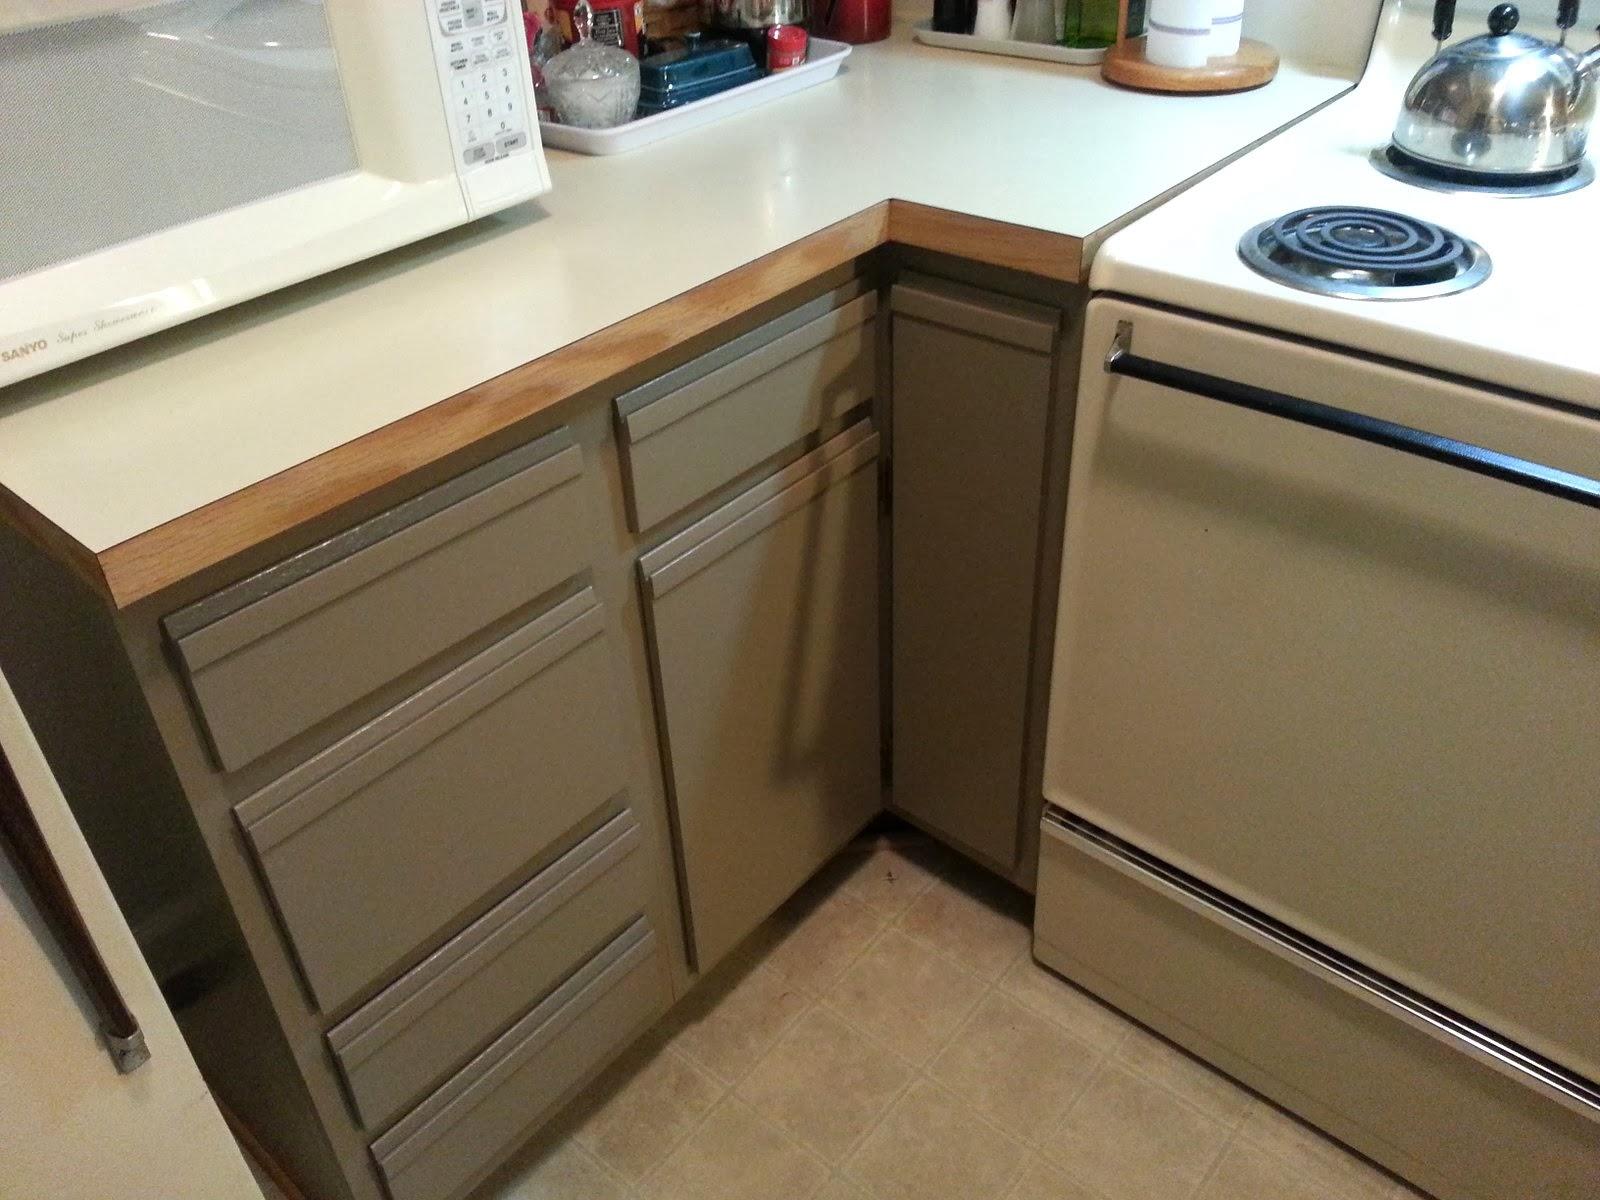 Foobella Design Painting Laminate Kitchen Cabinets Done